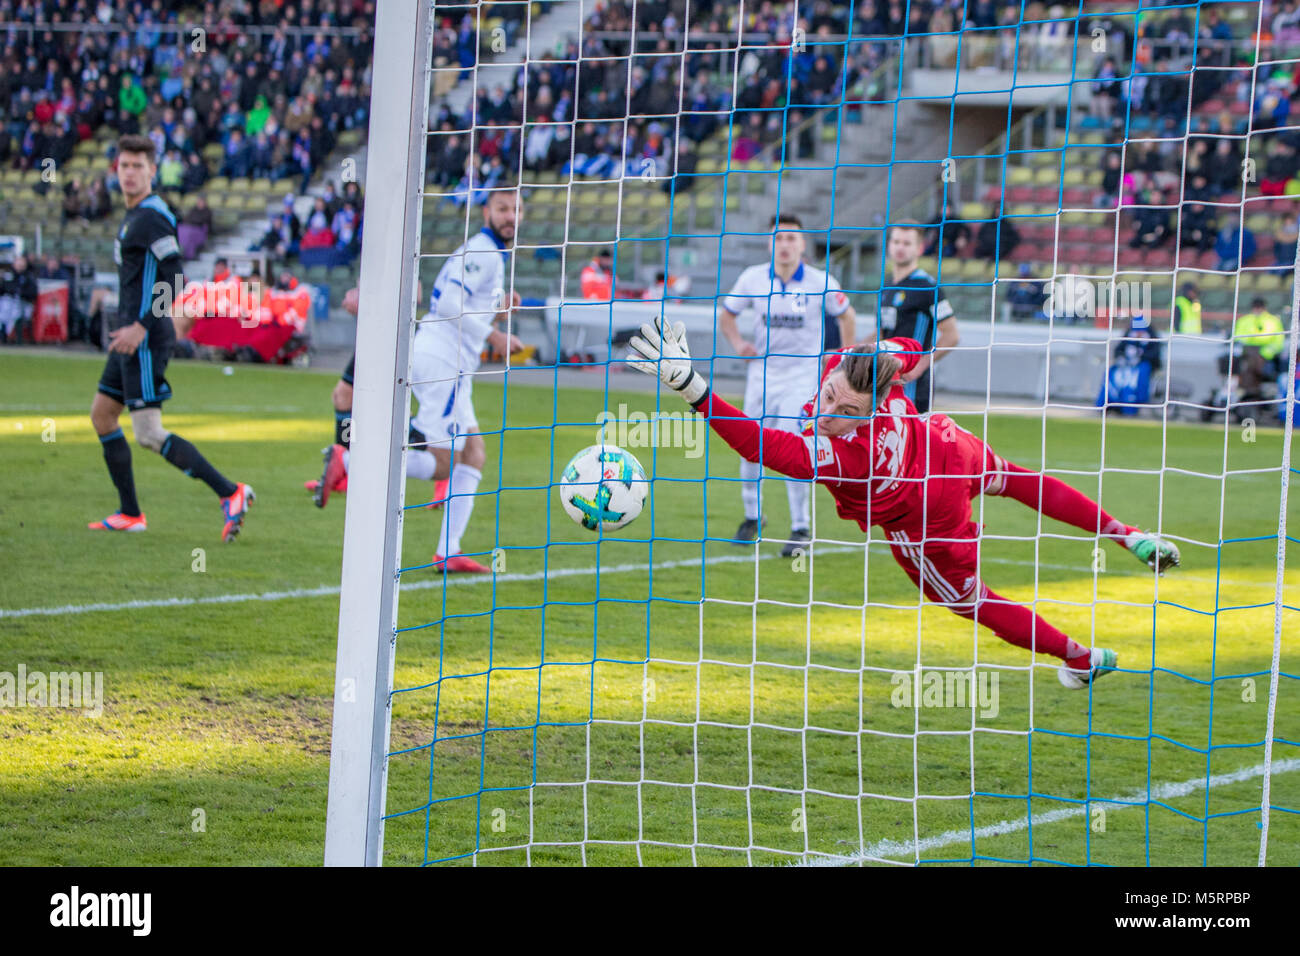 Karlsruhe, Germany. 25th Feb, 2018. Bundesliga soccer: Daniel Gordon (3) shoots the second goal, Keeper Kevin Tittel - Stock Image